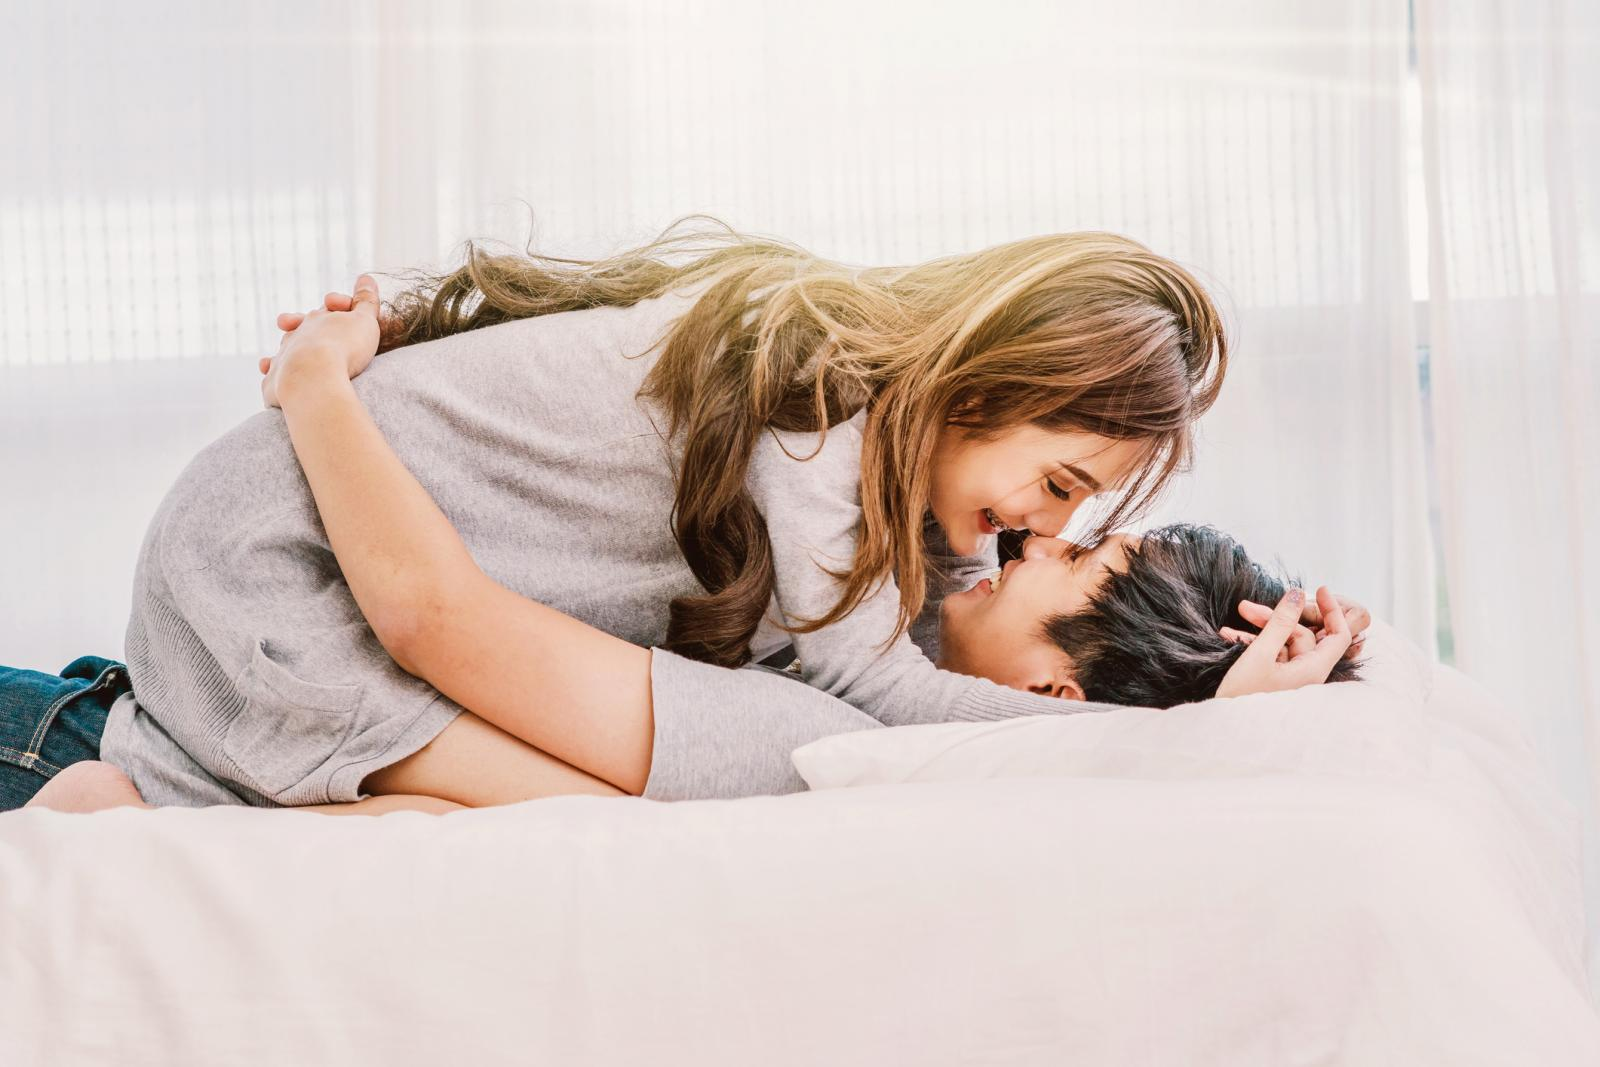 Pareja besandose en la cama